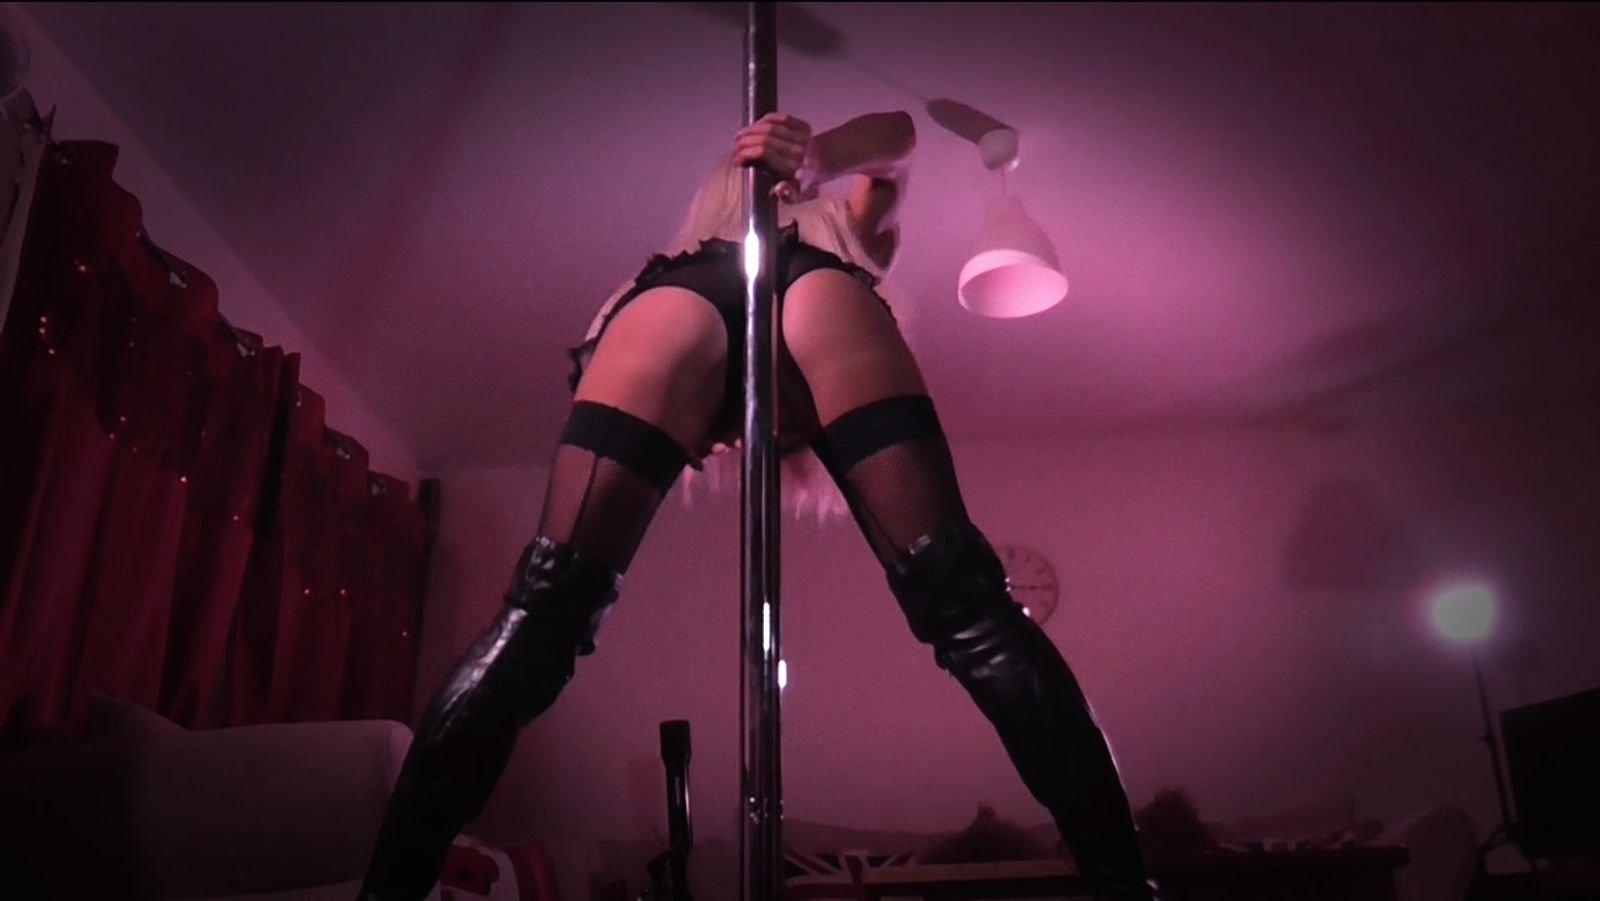 Free Teen Striptease Porn Pics